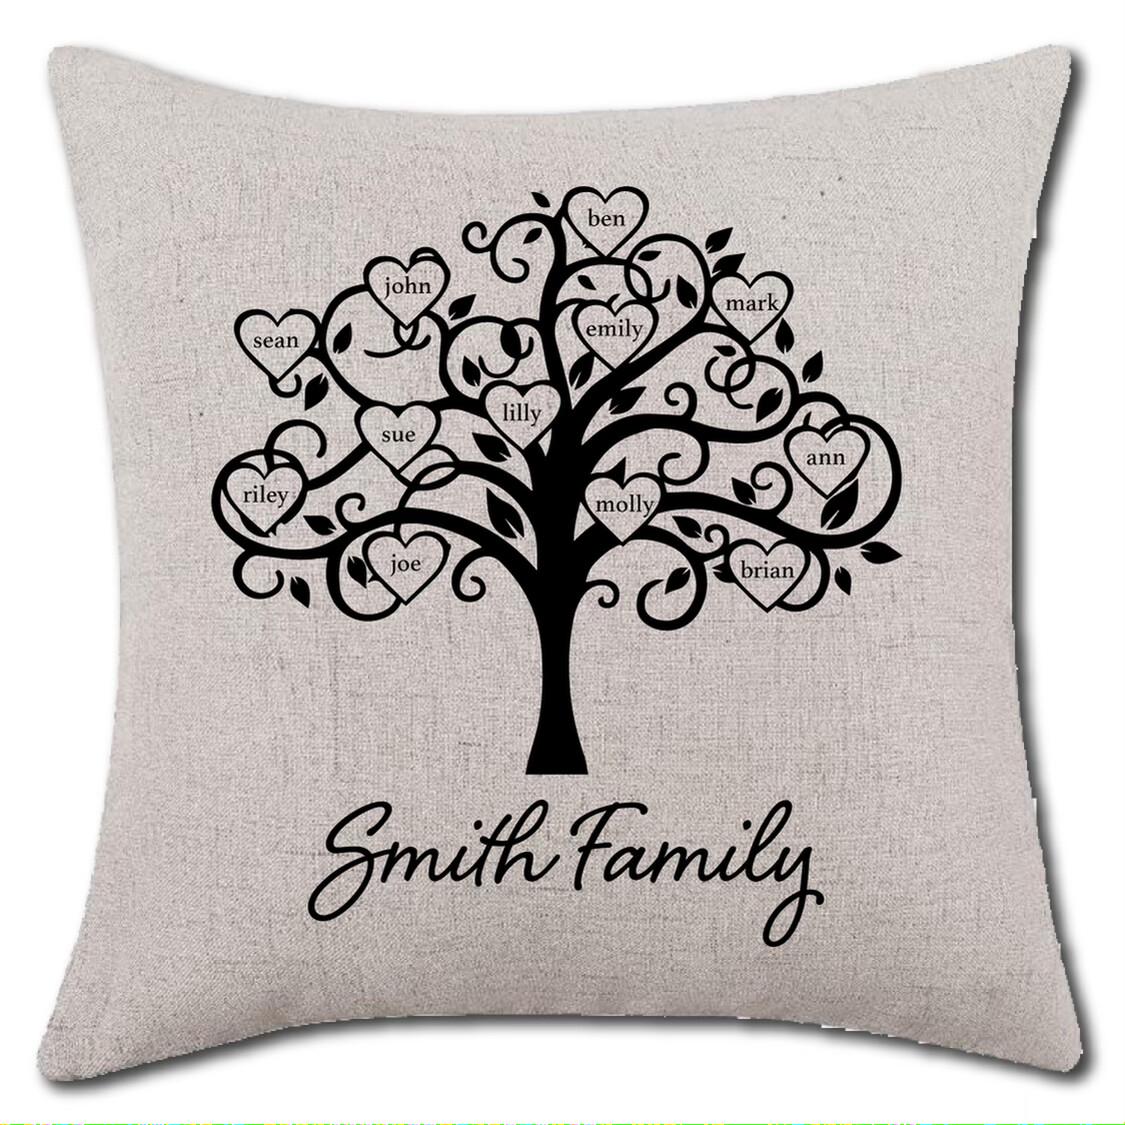 Customized Family Pillow